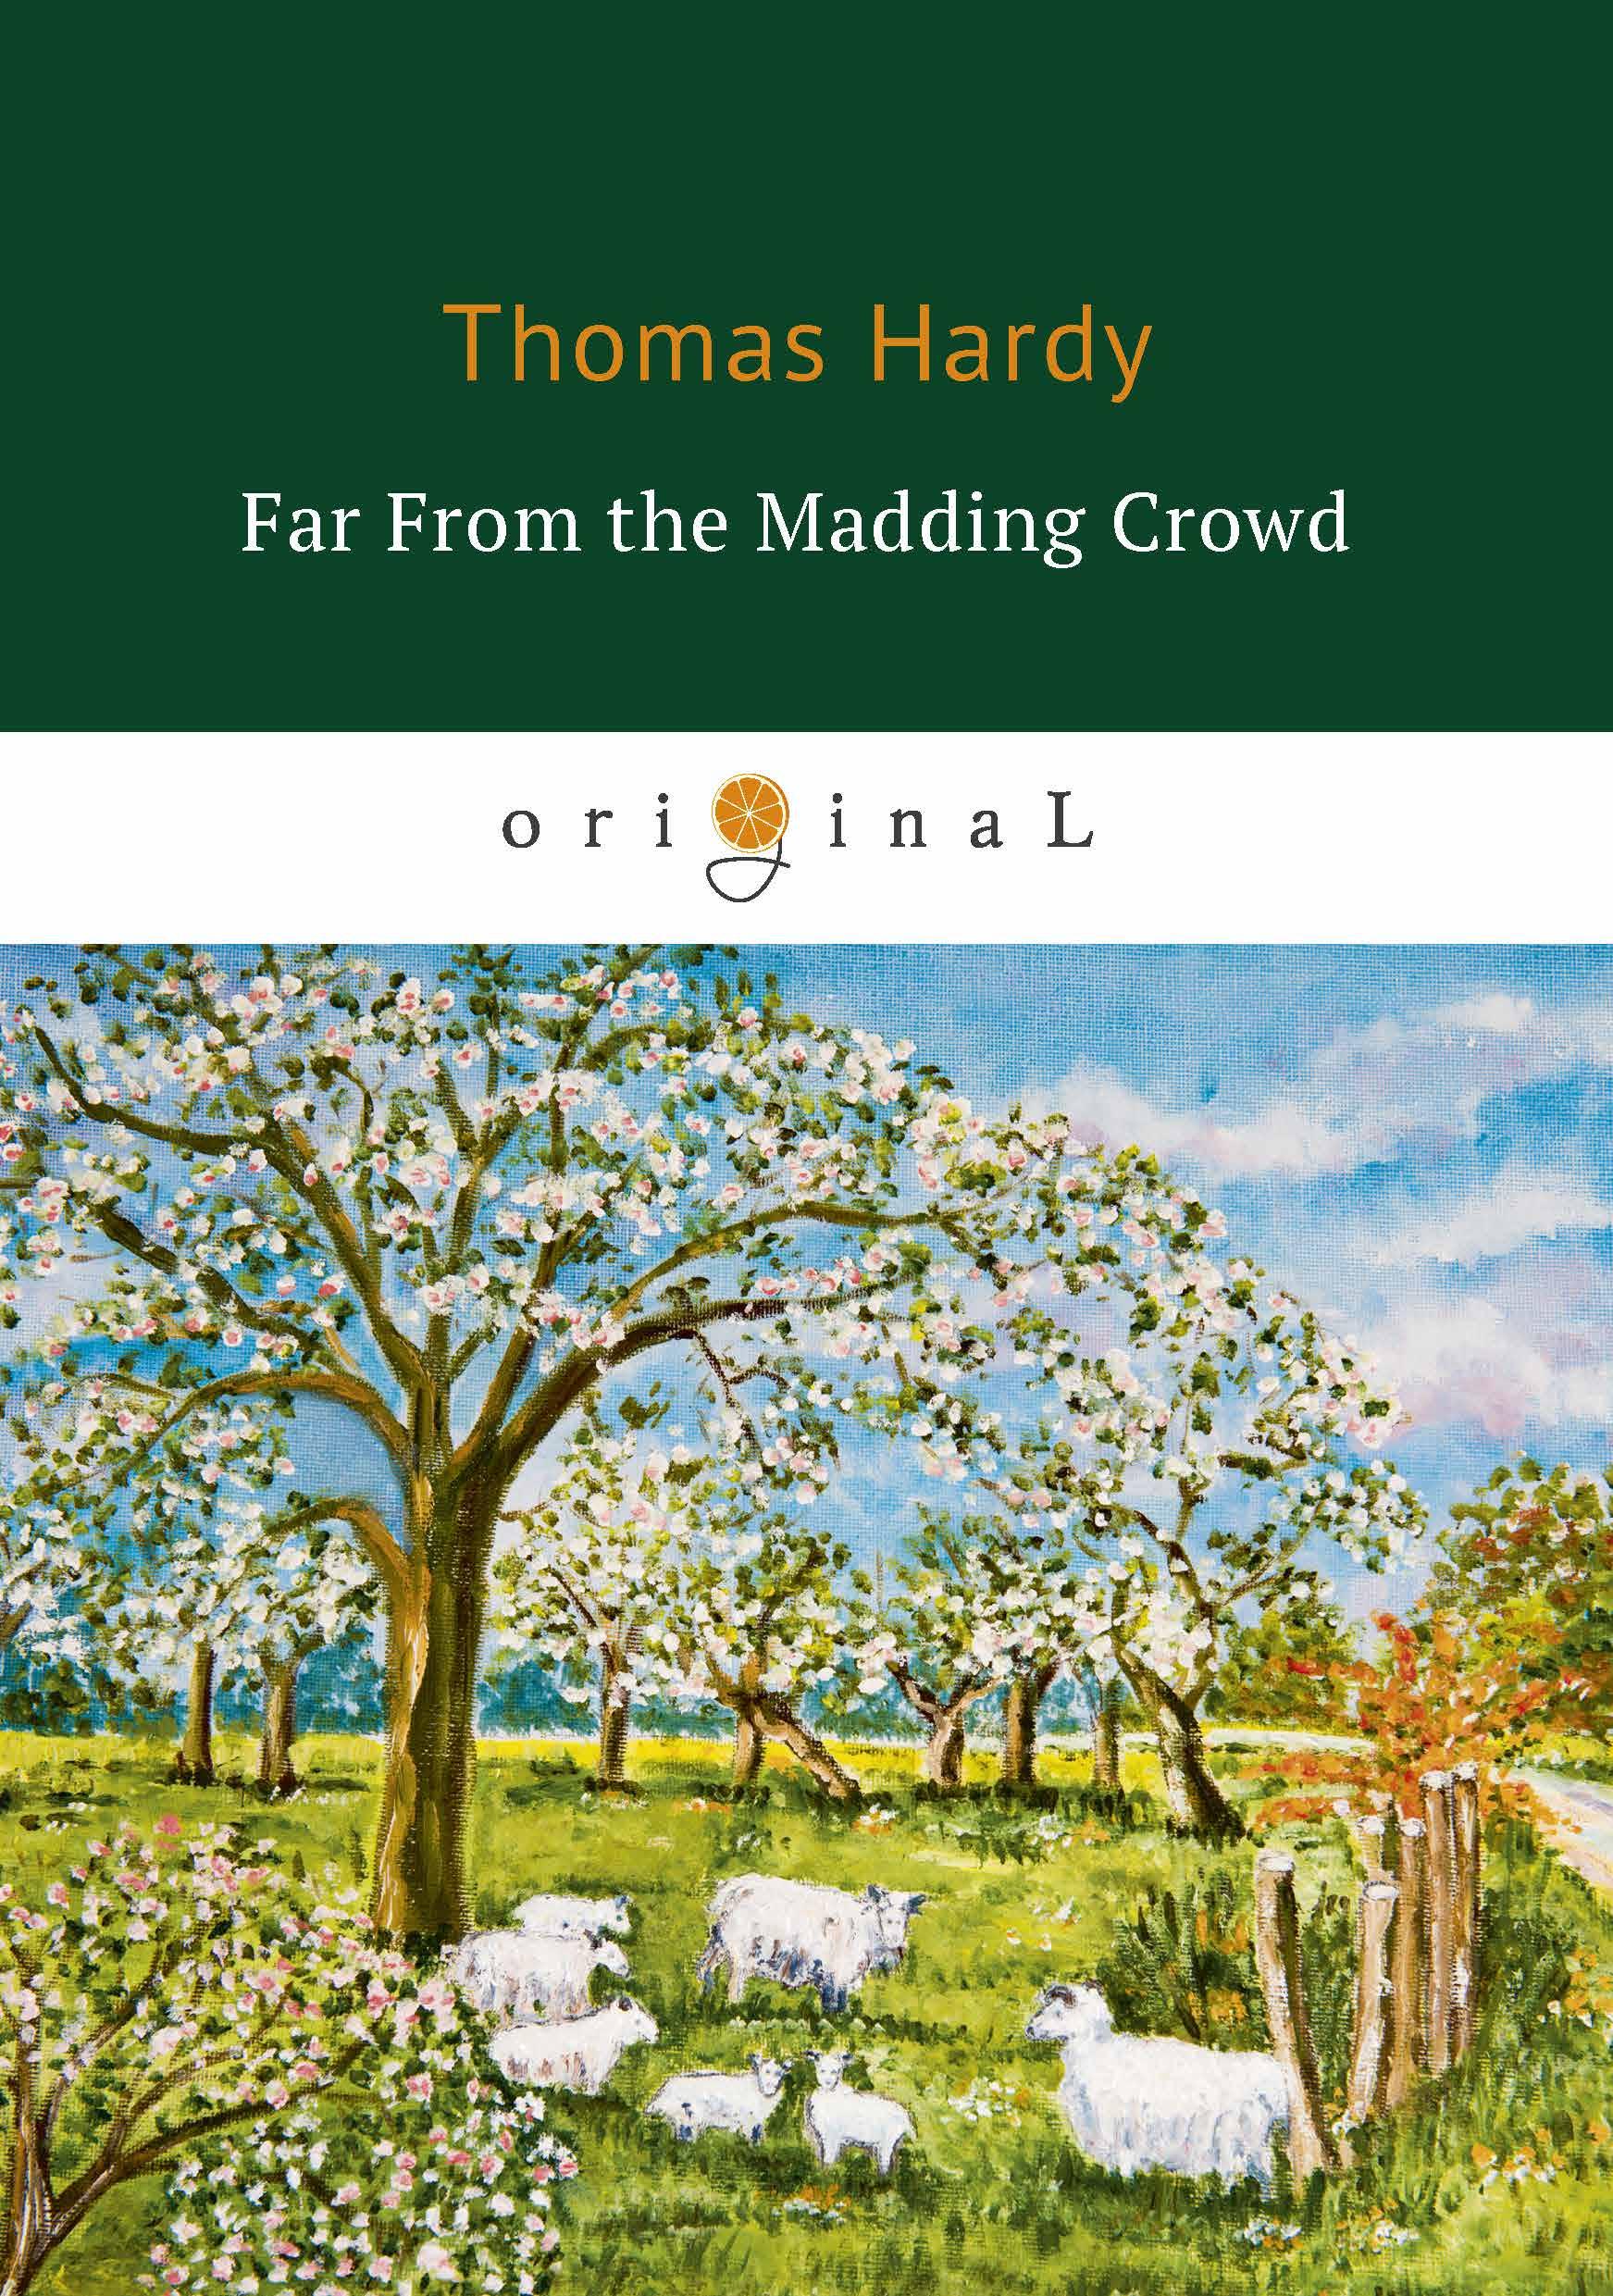 лучшая цена Thomas Hardy Far From the Madding Crowd